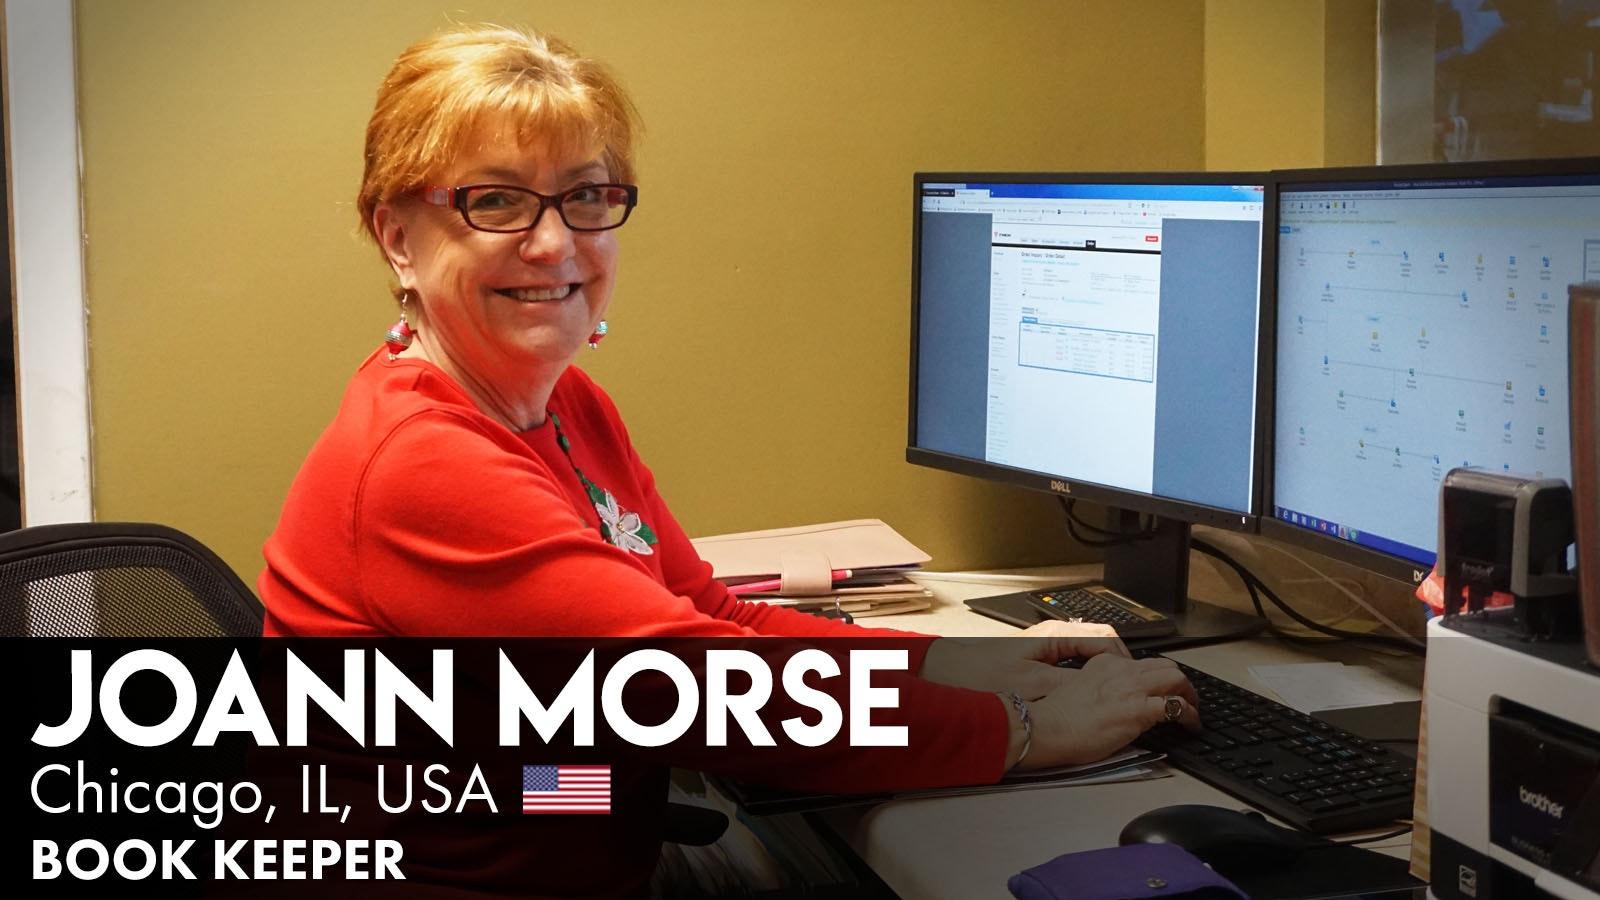 Joann Morse